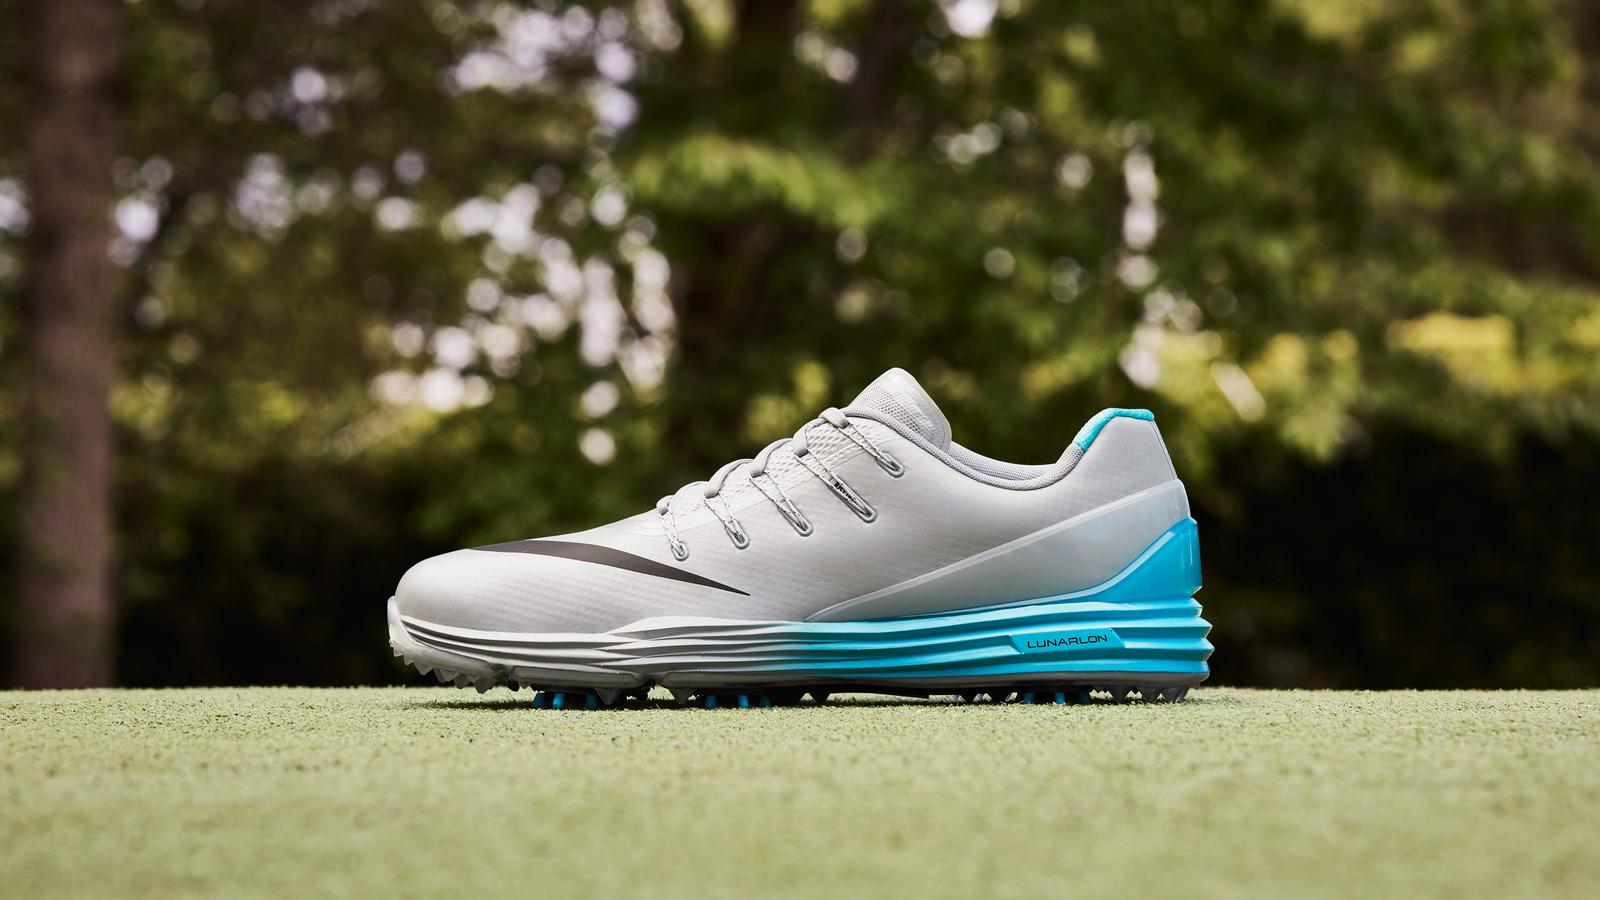 lunar jordan 4 golf shoes